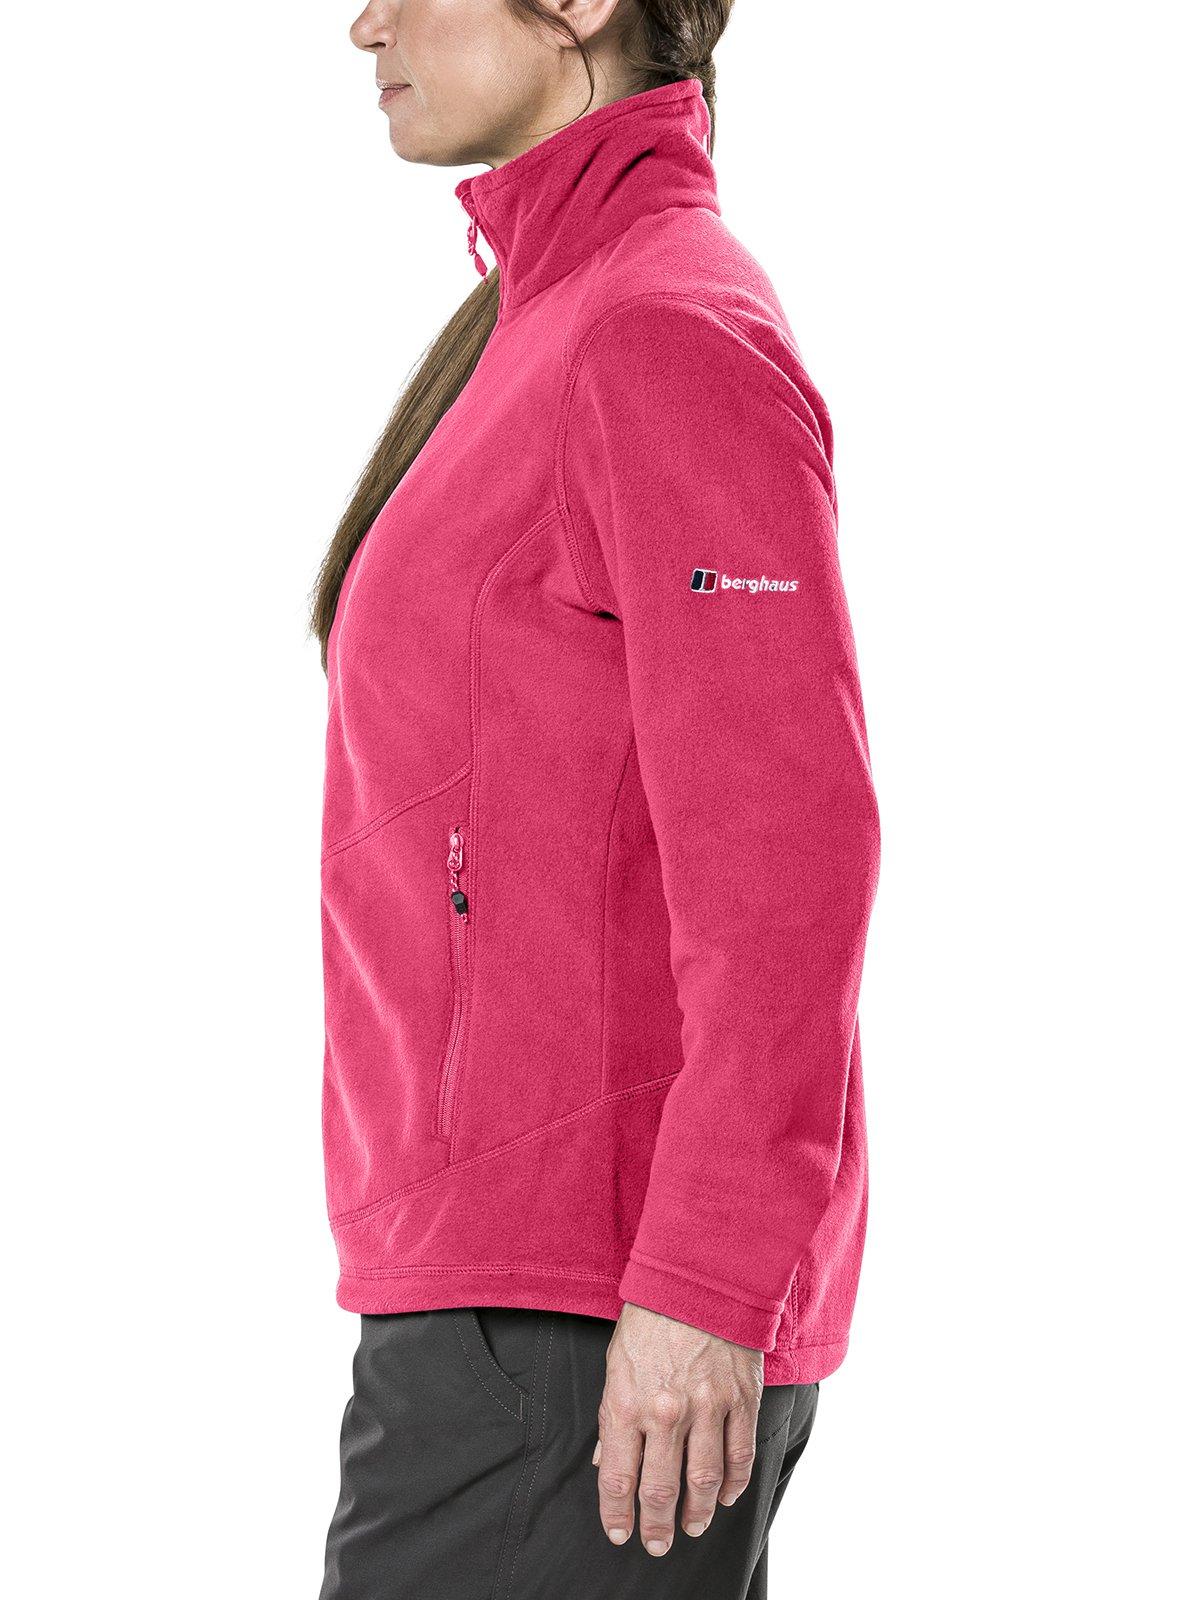 714rWeXRV5L - Berghaus Prism 2.0 Women's Fleece Jacket